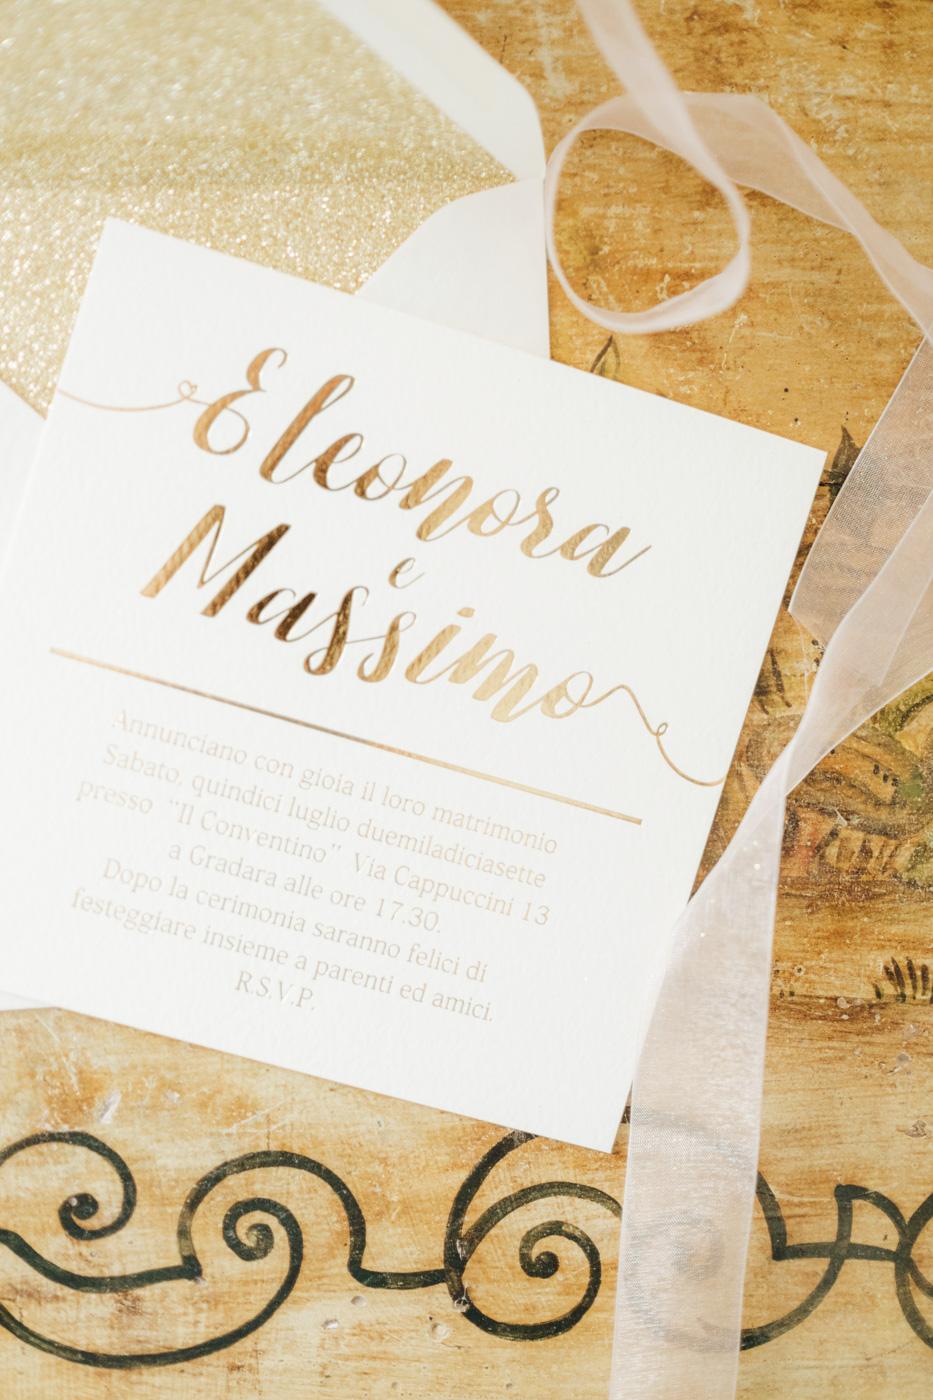 Matrimoni all'italiana wedding photographer italy-38.jpg